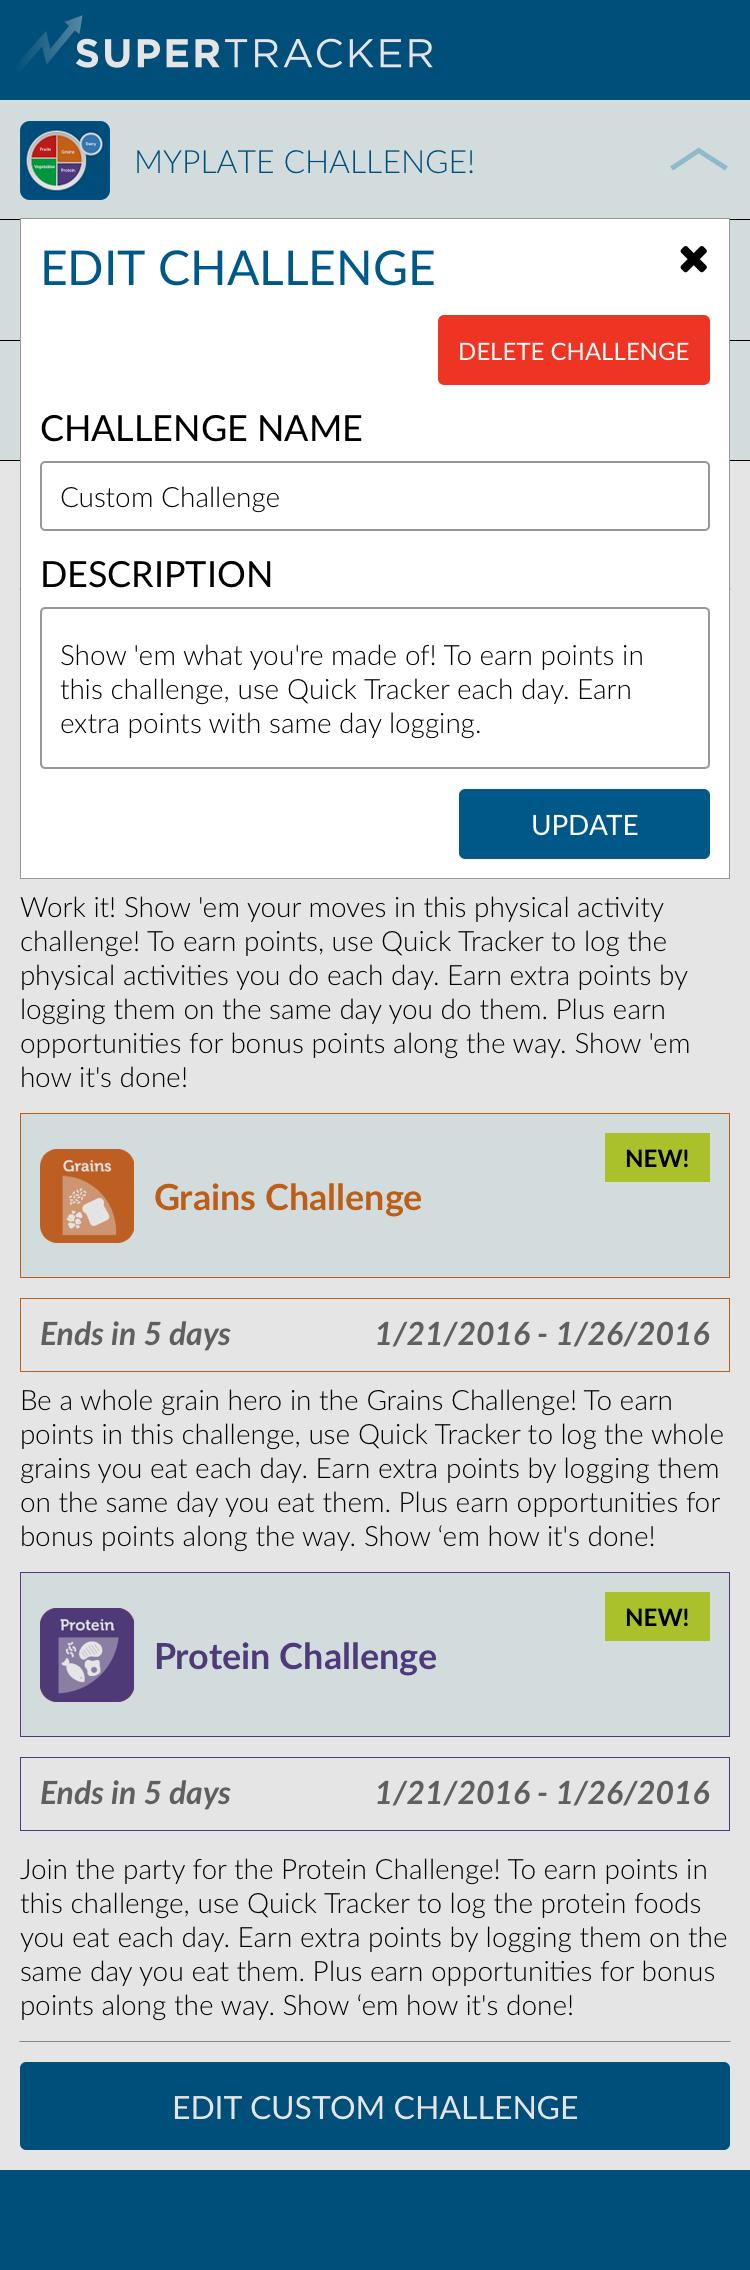 Custom - Main Group > Edit Challenge